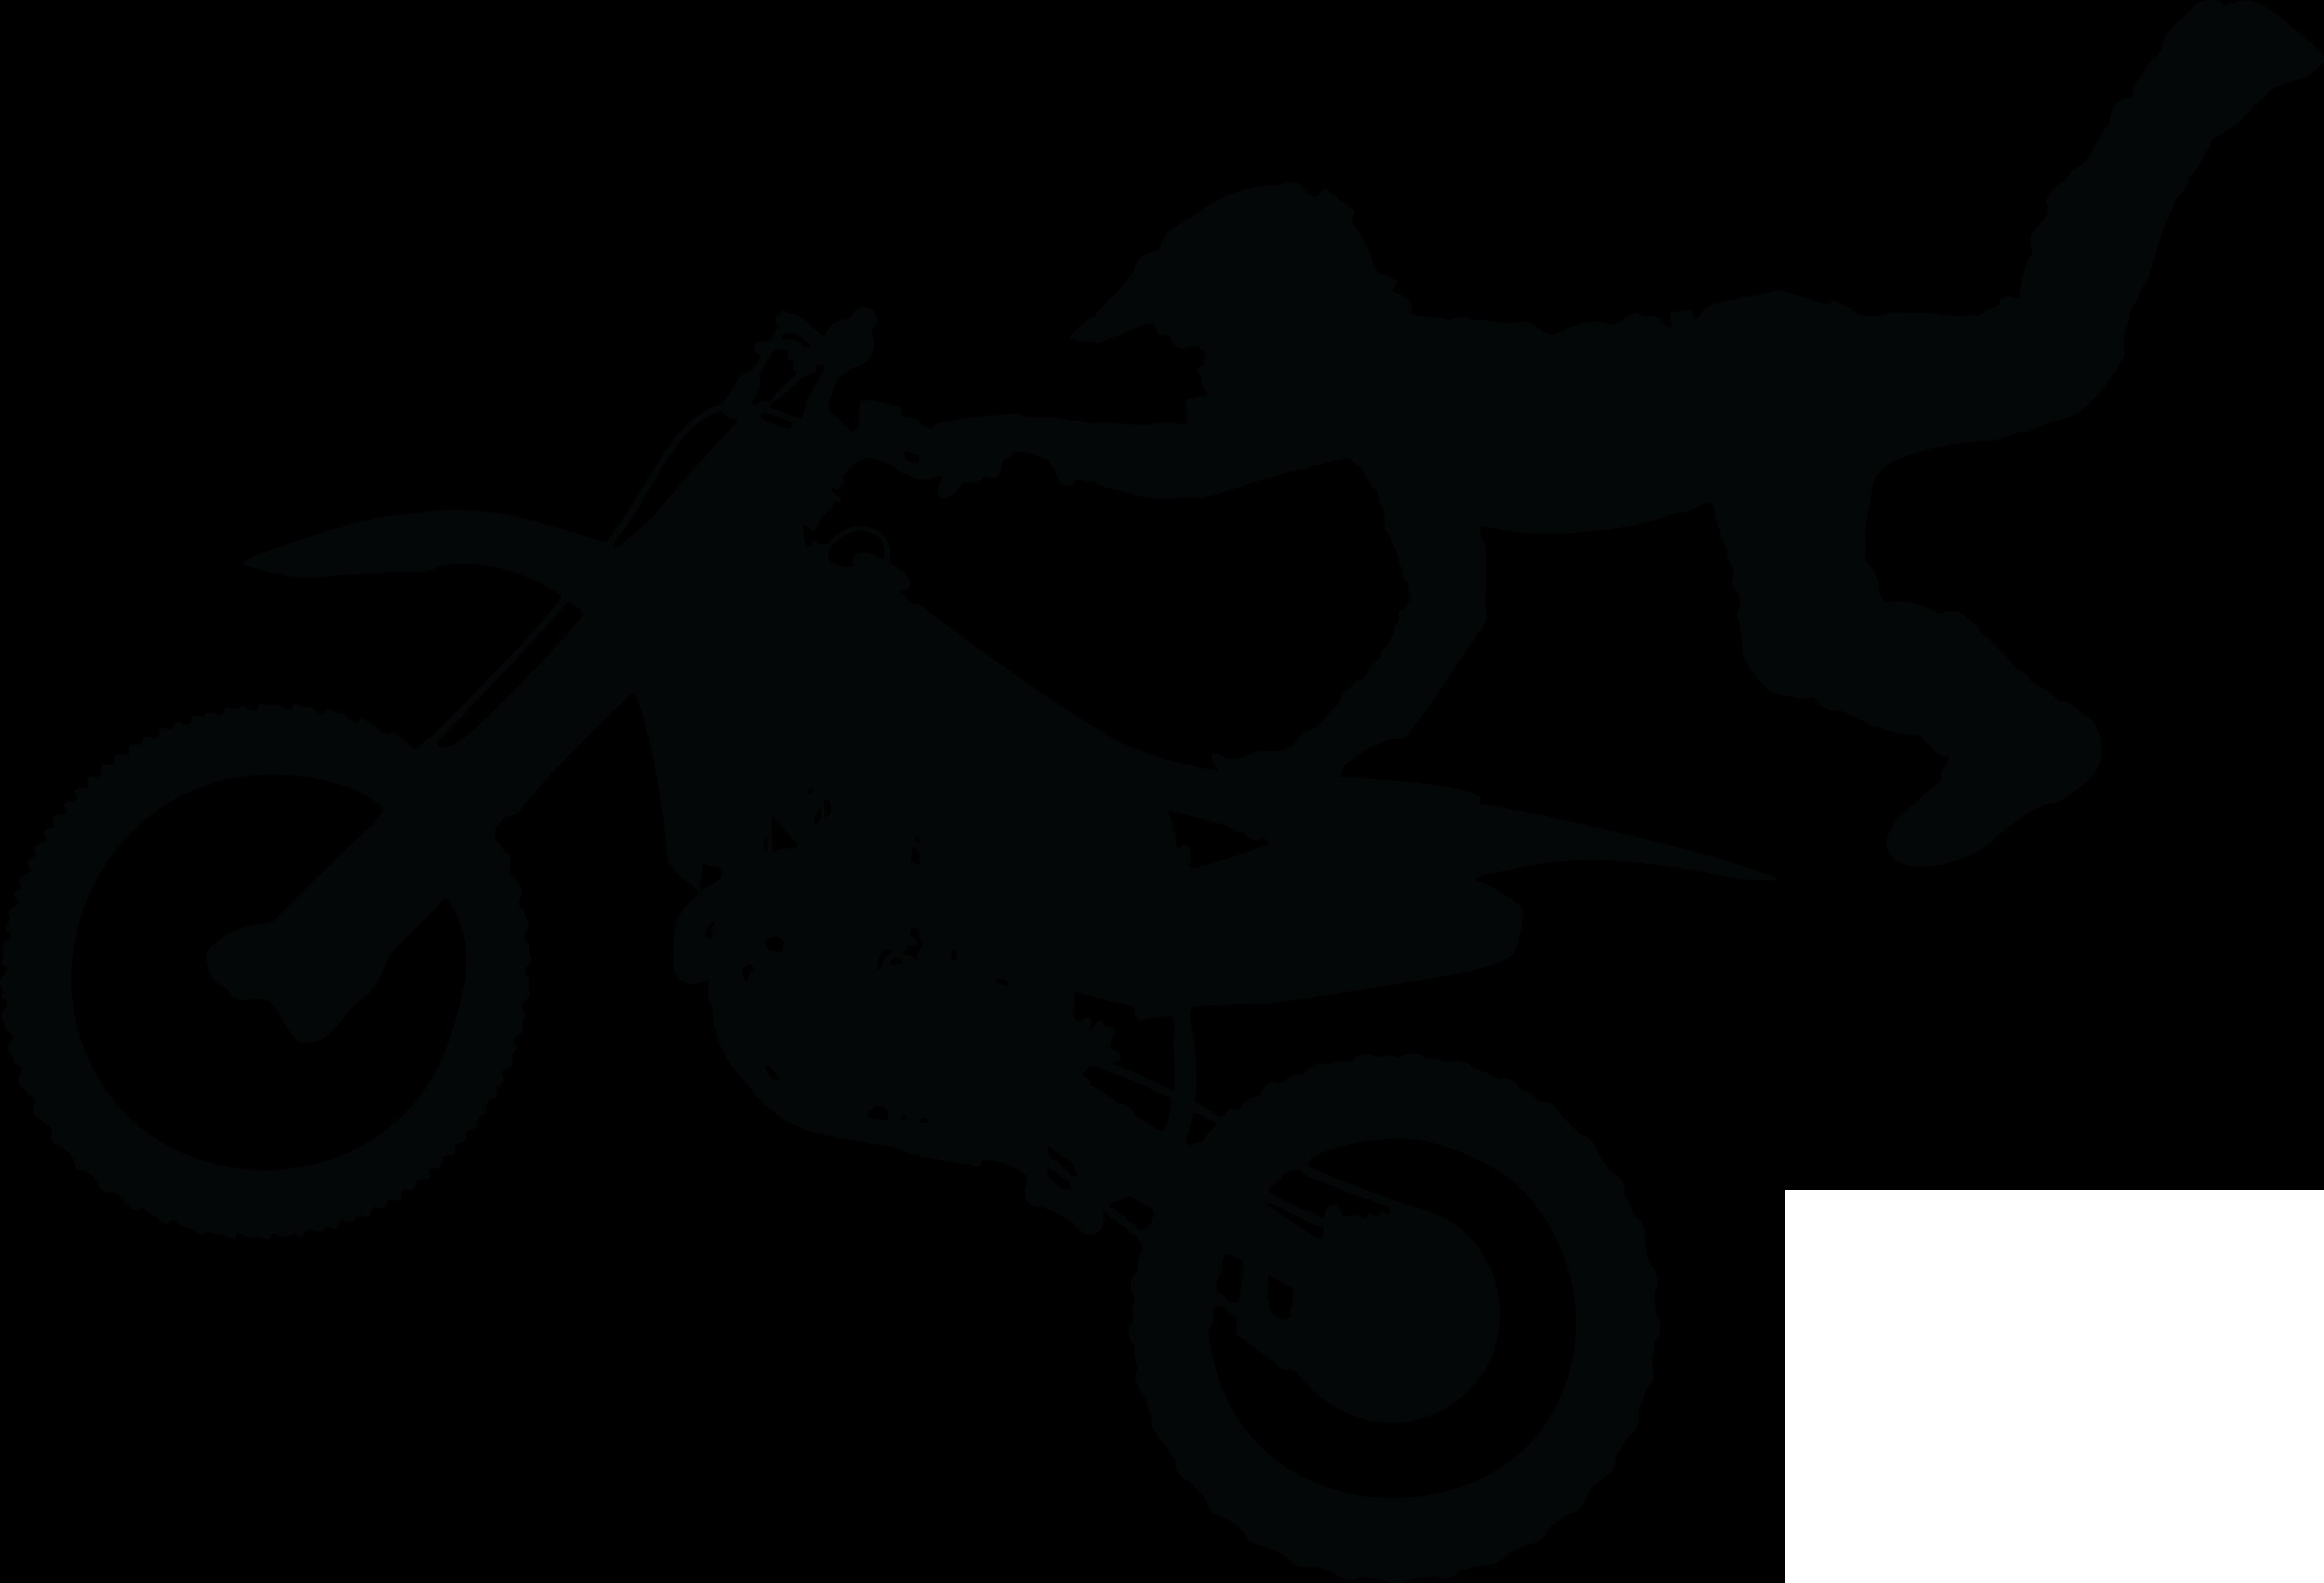 Motocross bike clipart jpg black and white Dirt Bike PNG Free Transparent Dirt Bike.PNG Images. | PlusPNG jpg black and white